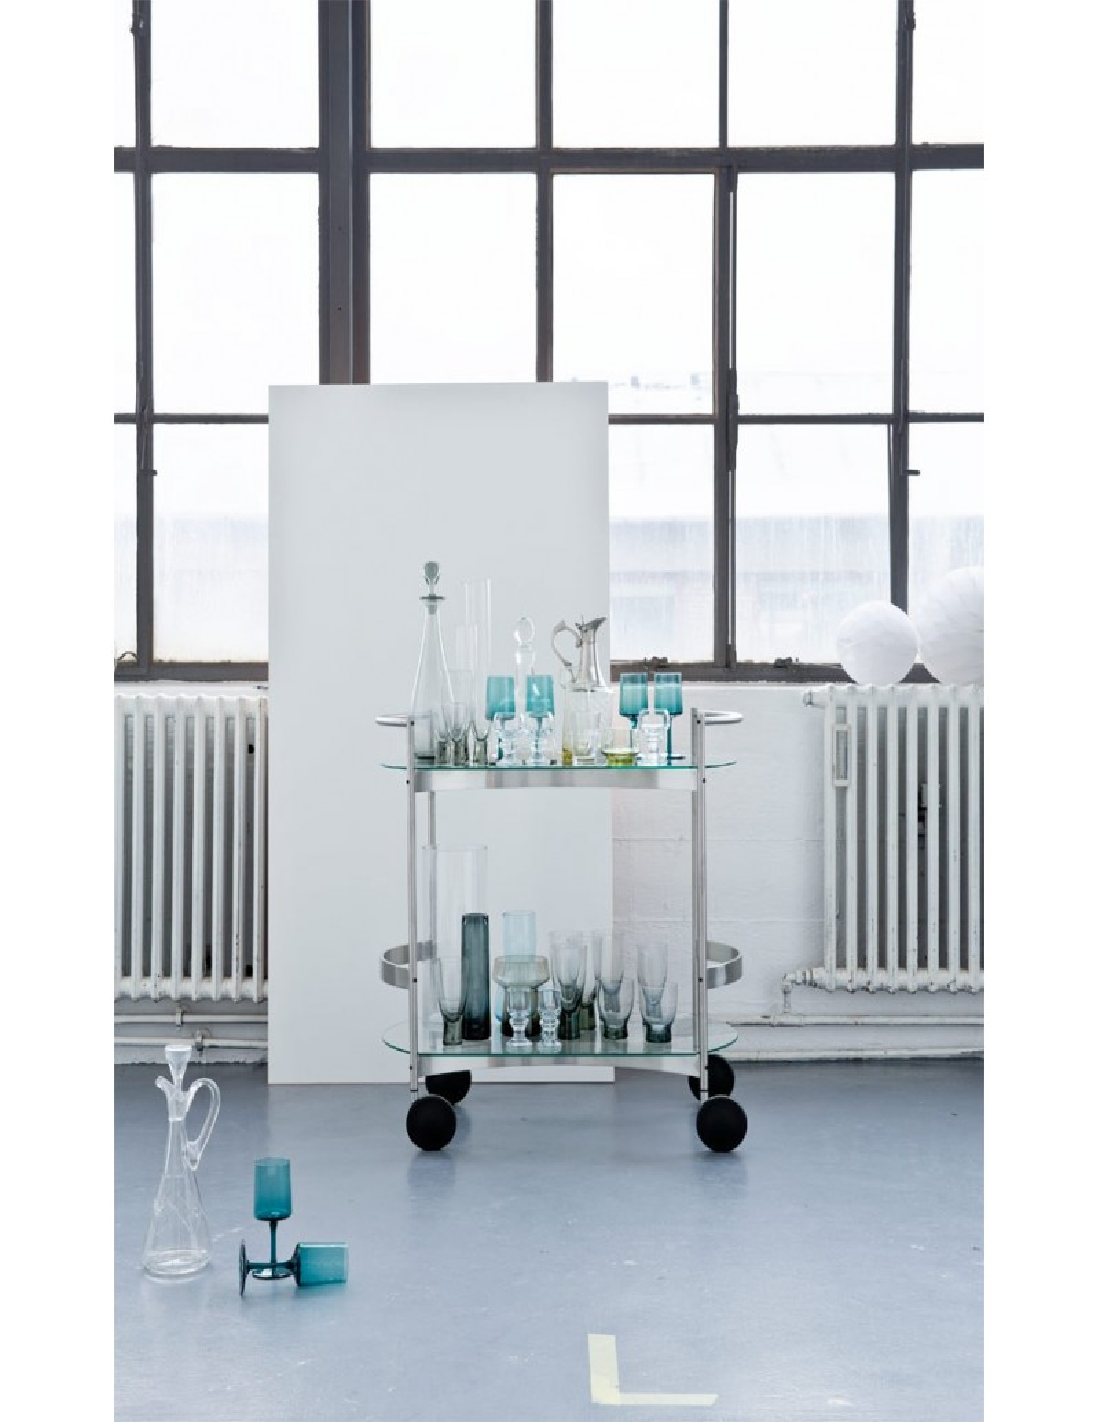 desserte orbis de takashi okamura la boutique danoise. Black Bedroom Furniture Sets. Home Design Ideas